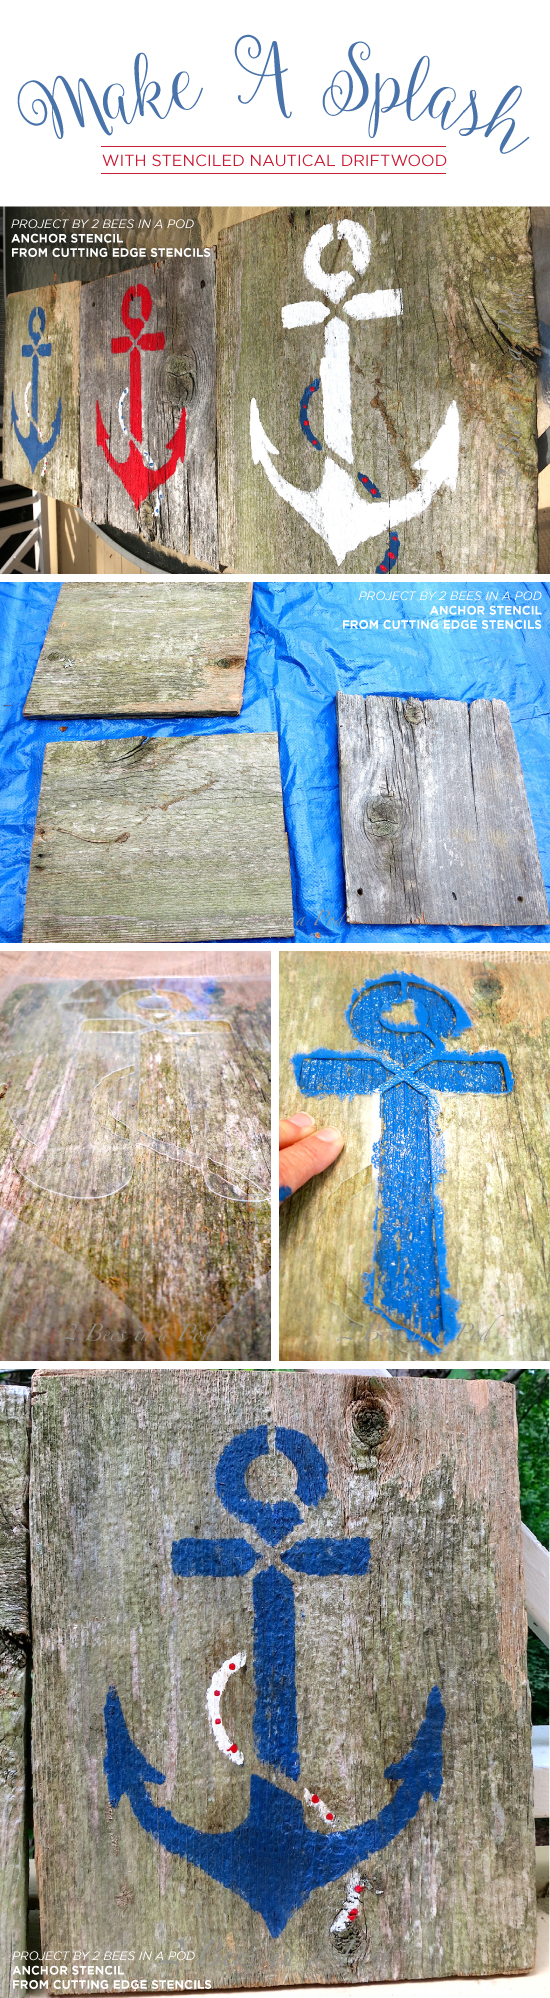 Learn how to stencil DIY reclaimed wood using the Anchor Stencil from Cutting Edge Stencils. http://www.cuttingedgestencils.com/beach-decor-anchor-stencil.html